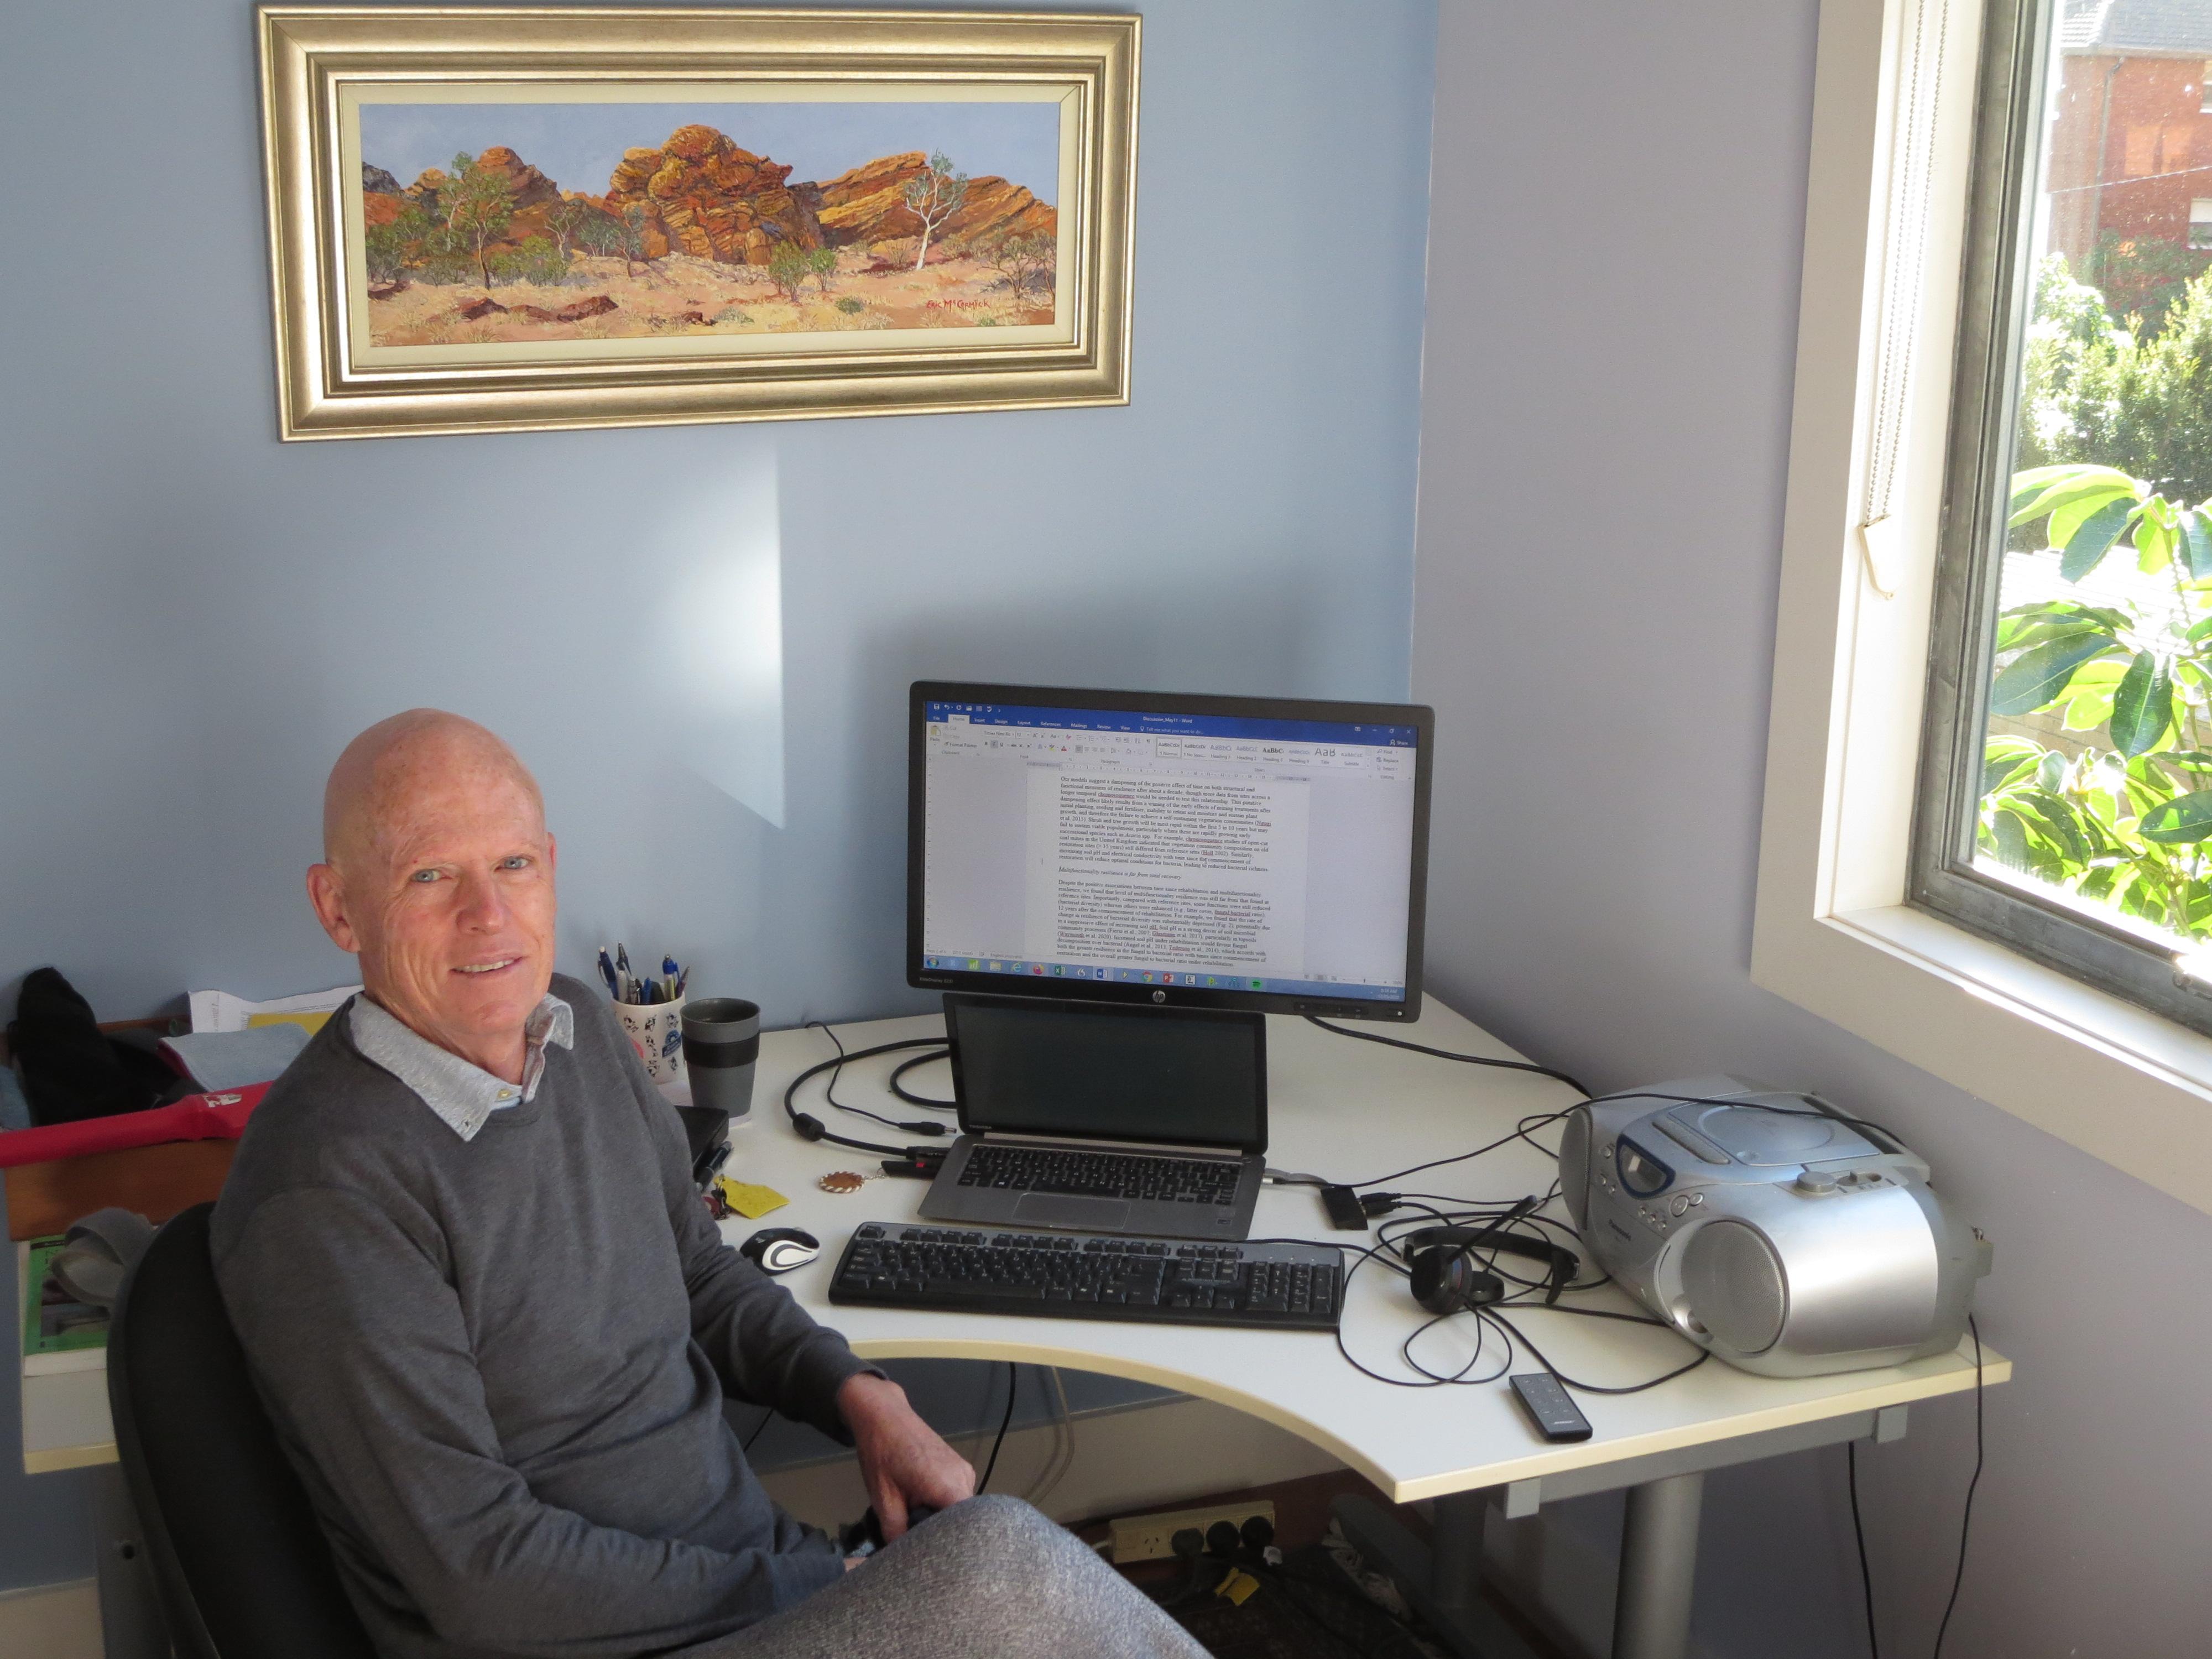 David Eldridge in his home office